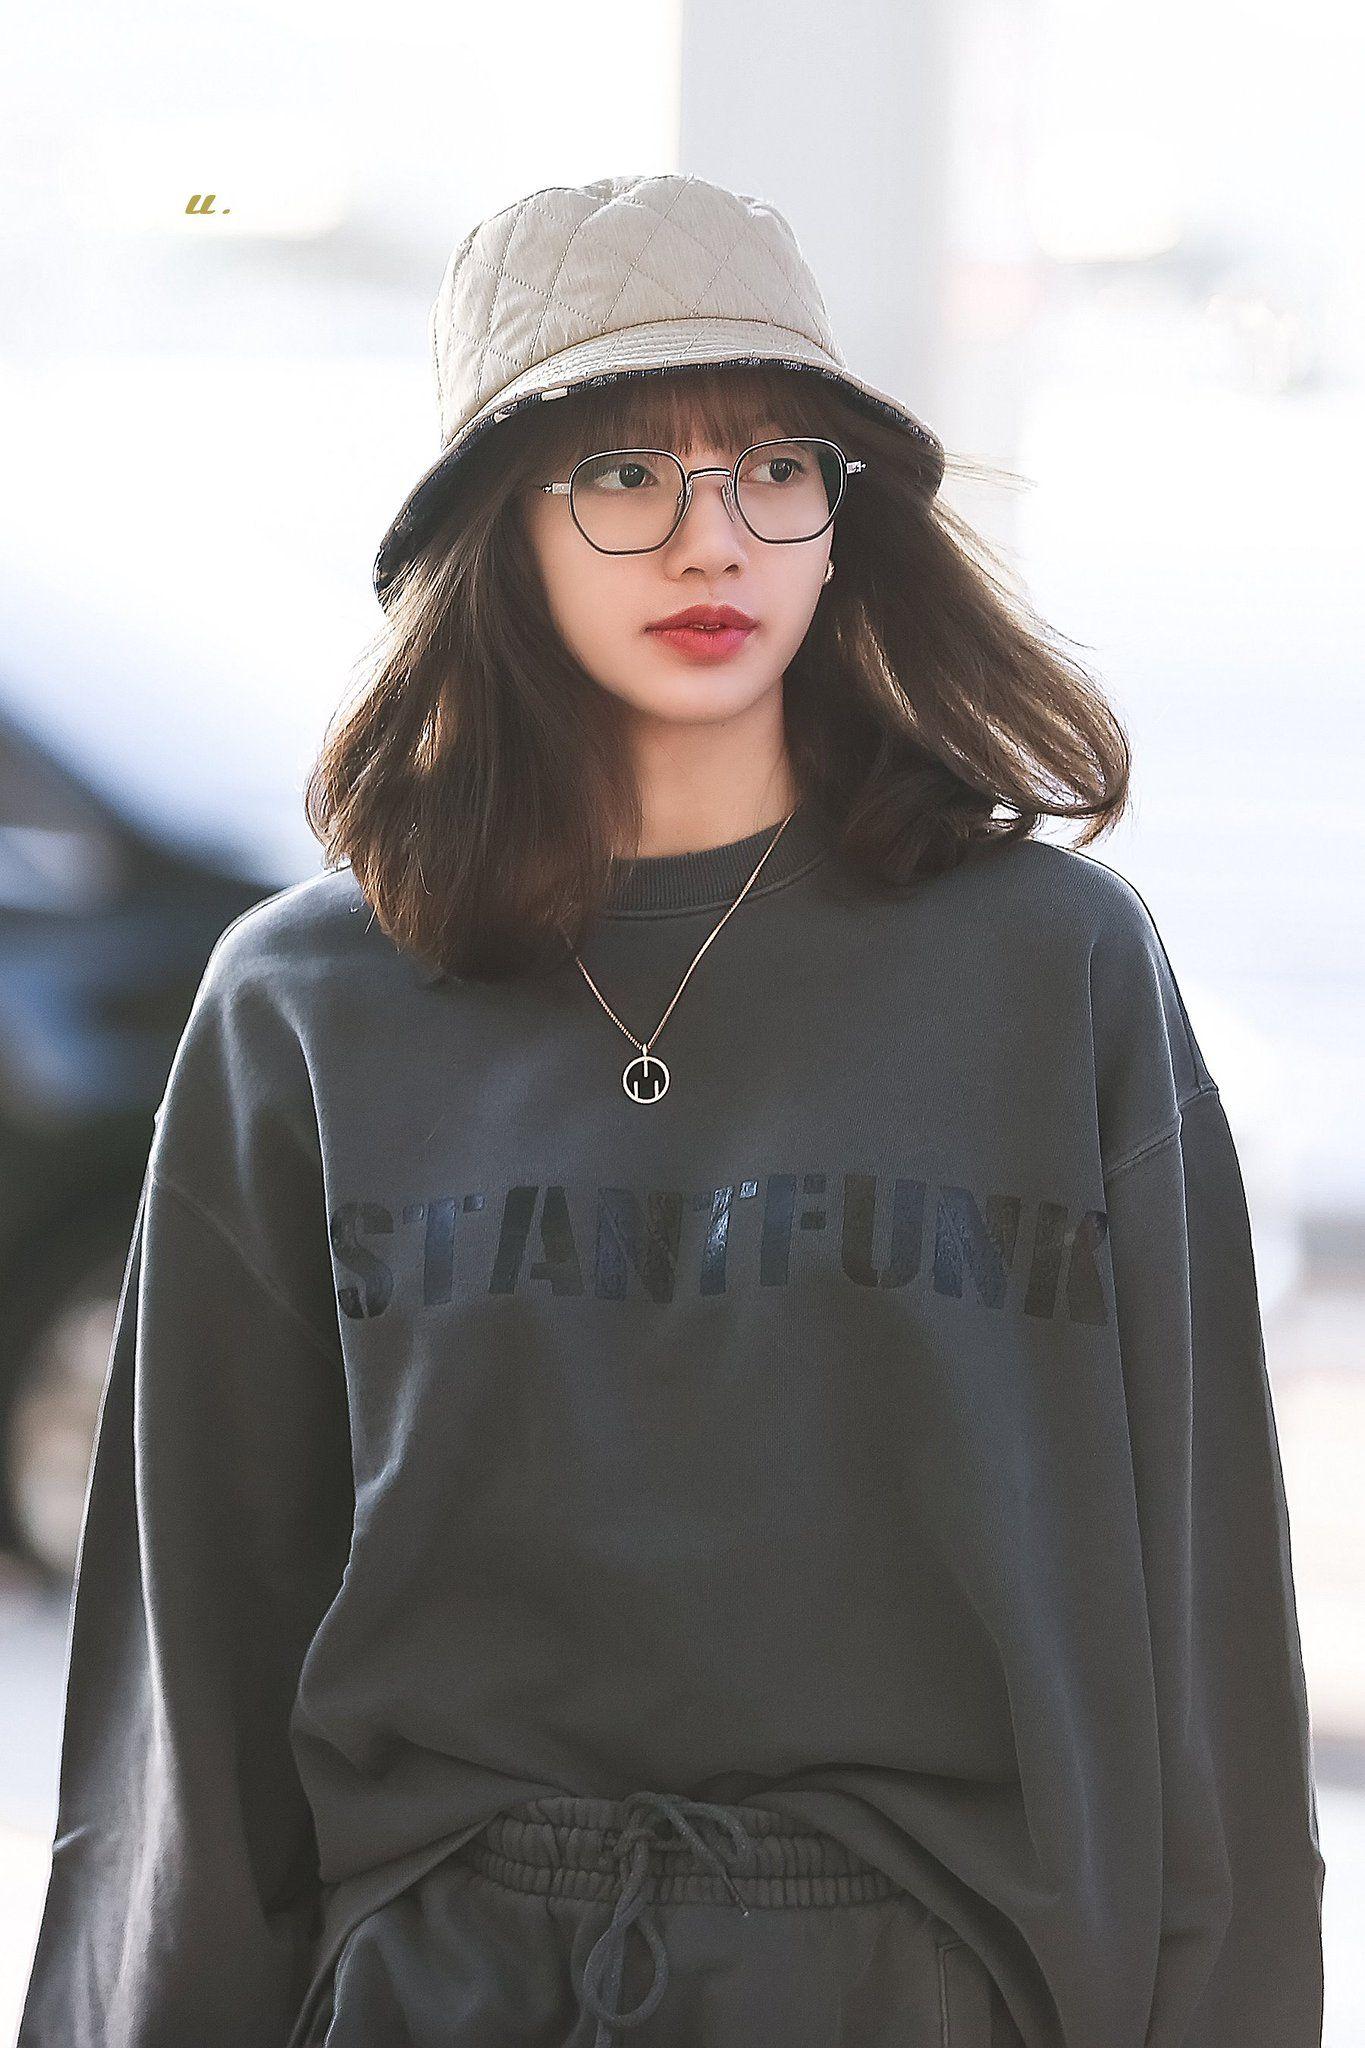 ʟʟ On Twitter Lisa Blackpink Wallpaper Blackpink Fashion Blackpink Lisa